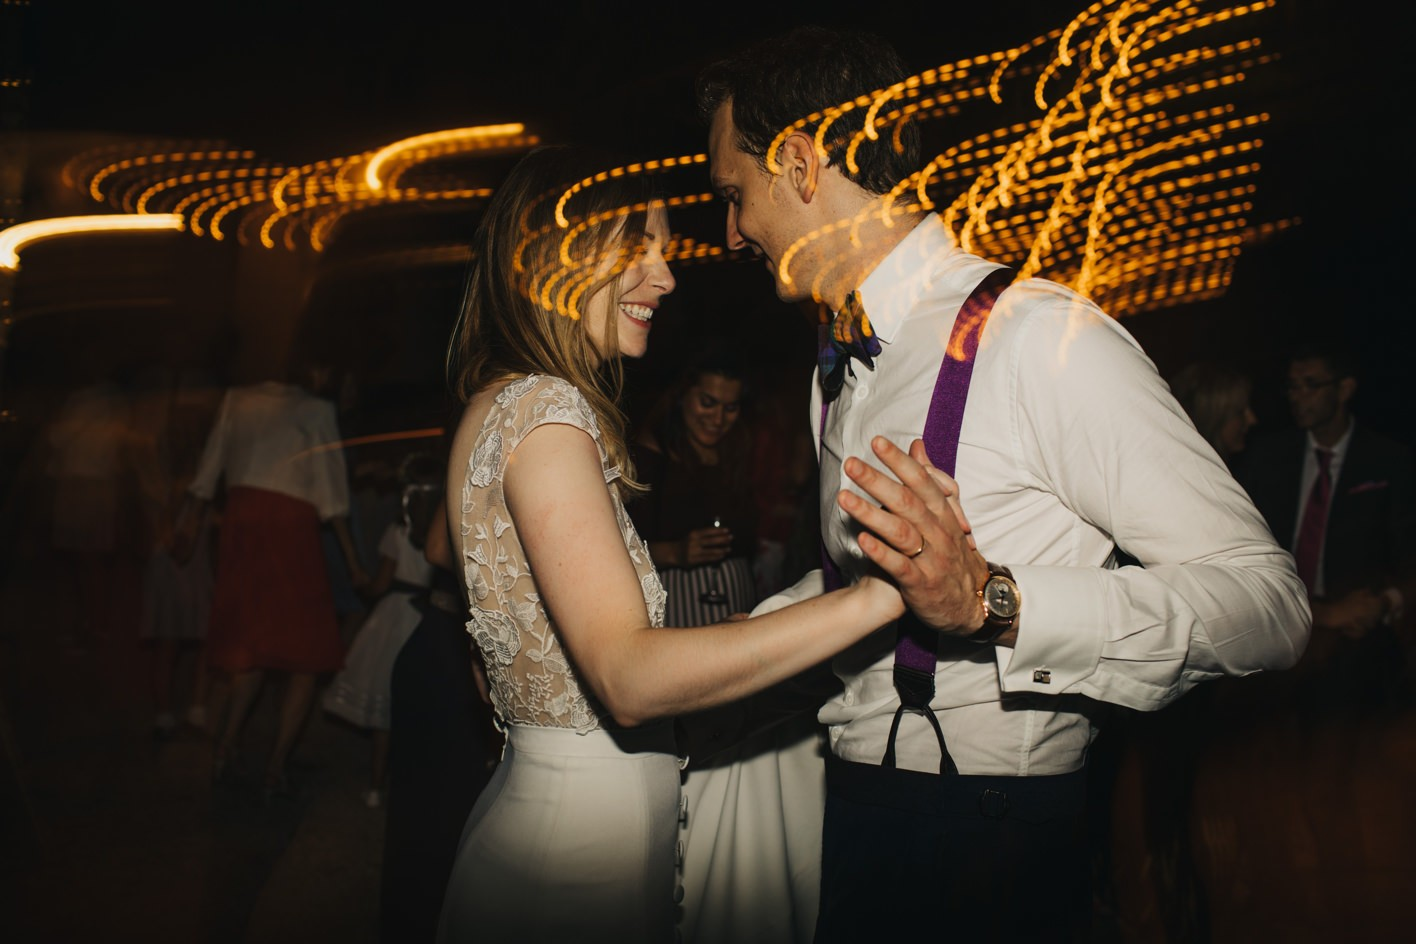 bride and groom on dancefloor at french wedding